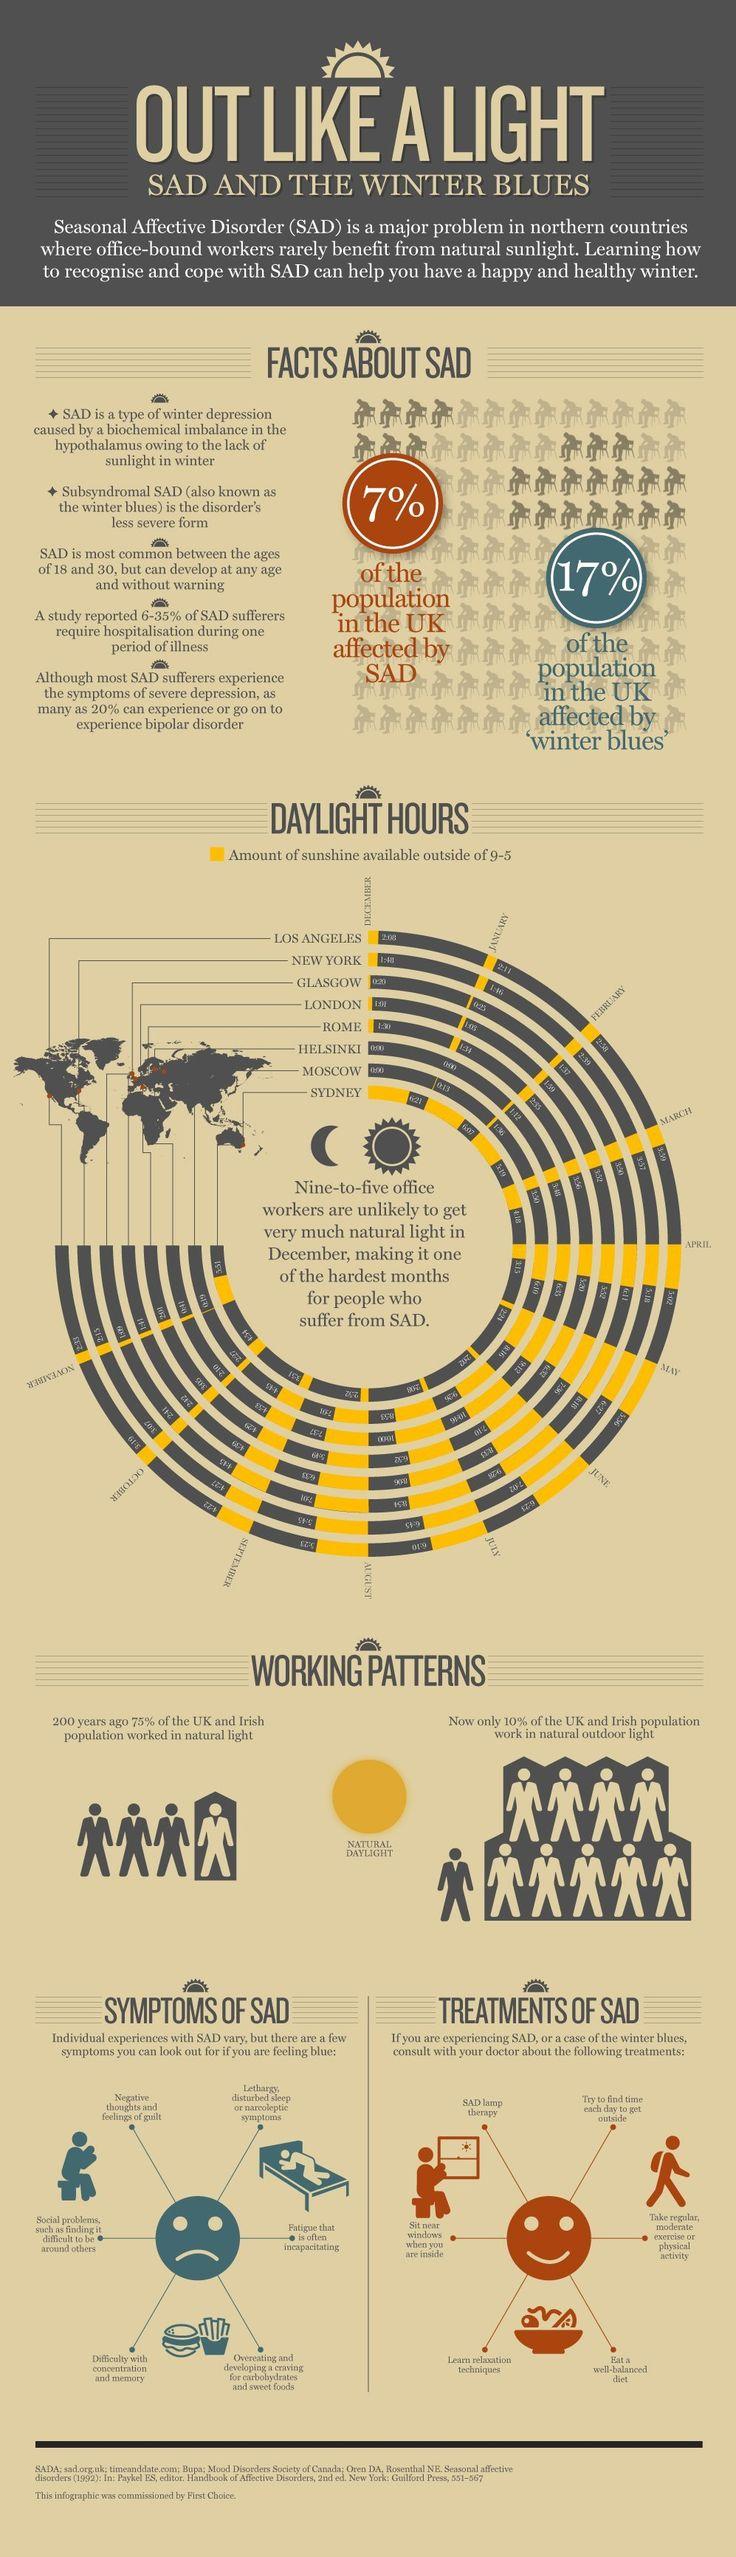 Seasonal Affective Disorder Infographic